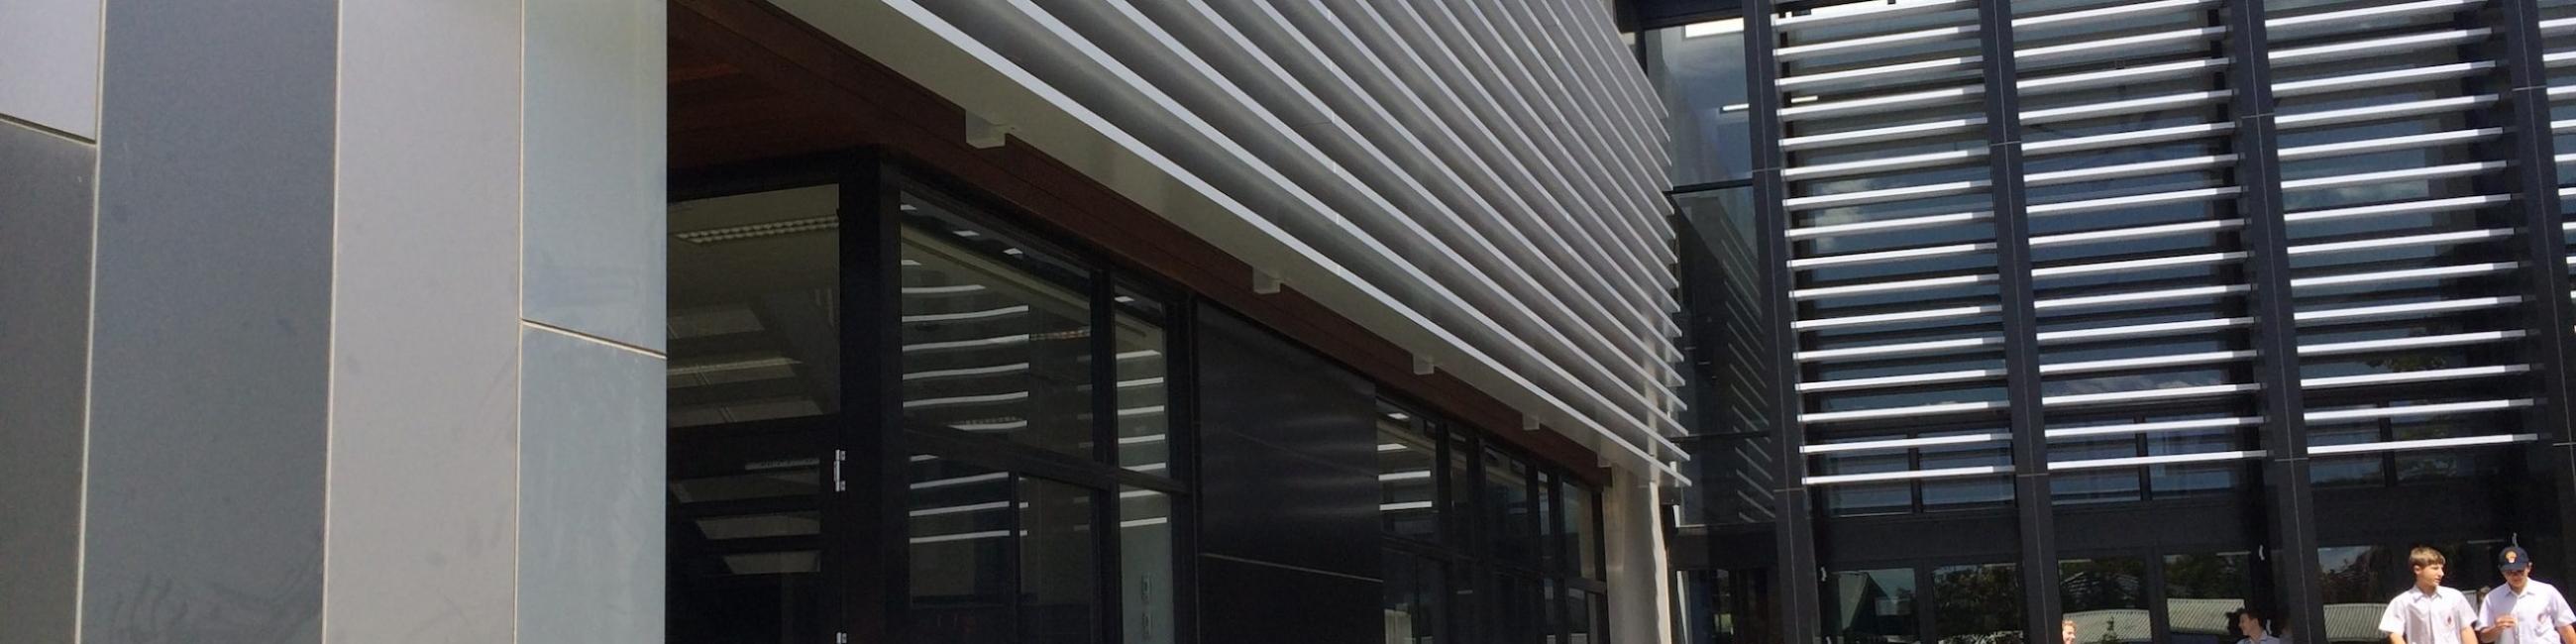 Brighton School PA Install